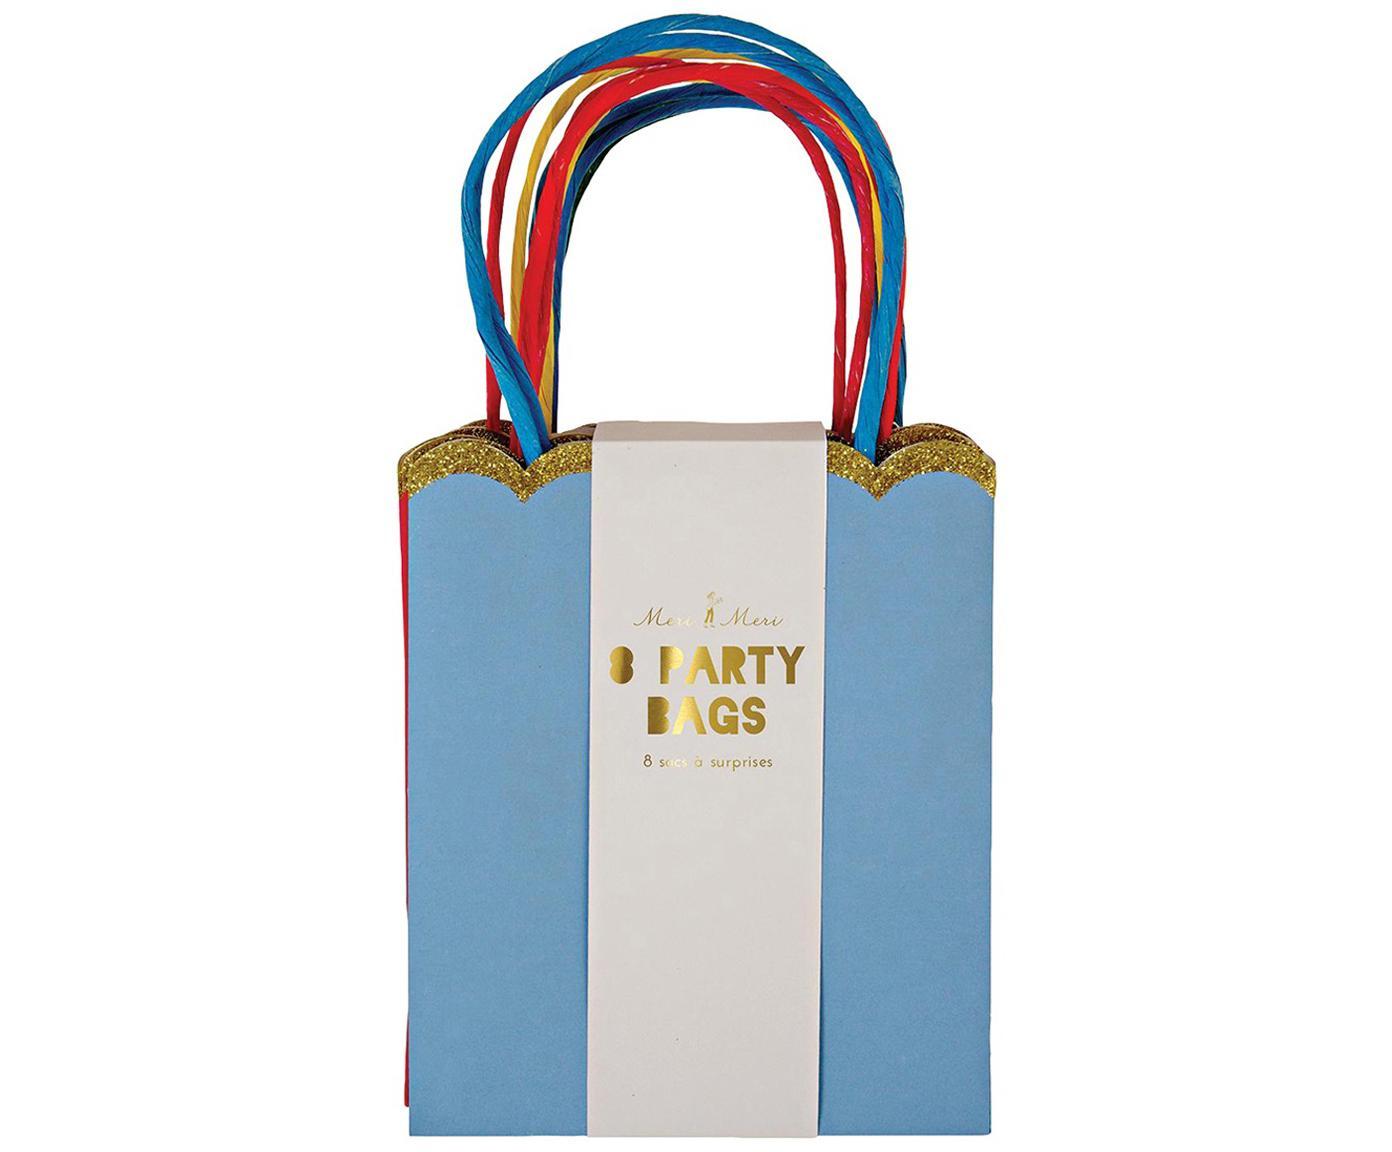 Bolsas para regalo Jess, 8pzas., Papel, cartón, Multicolor, An 13 x Al 23 cm